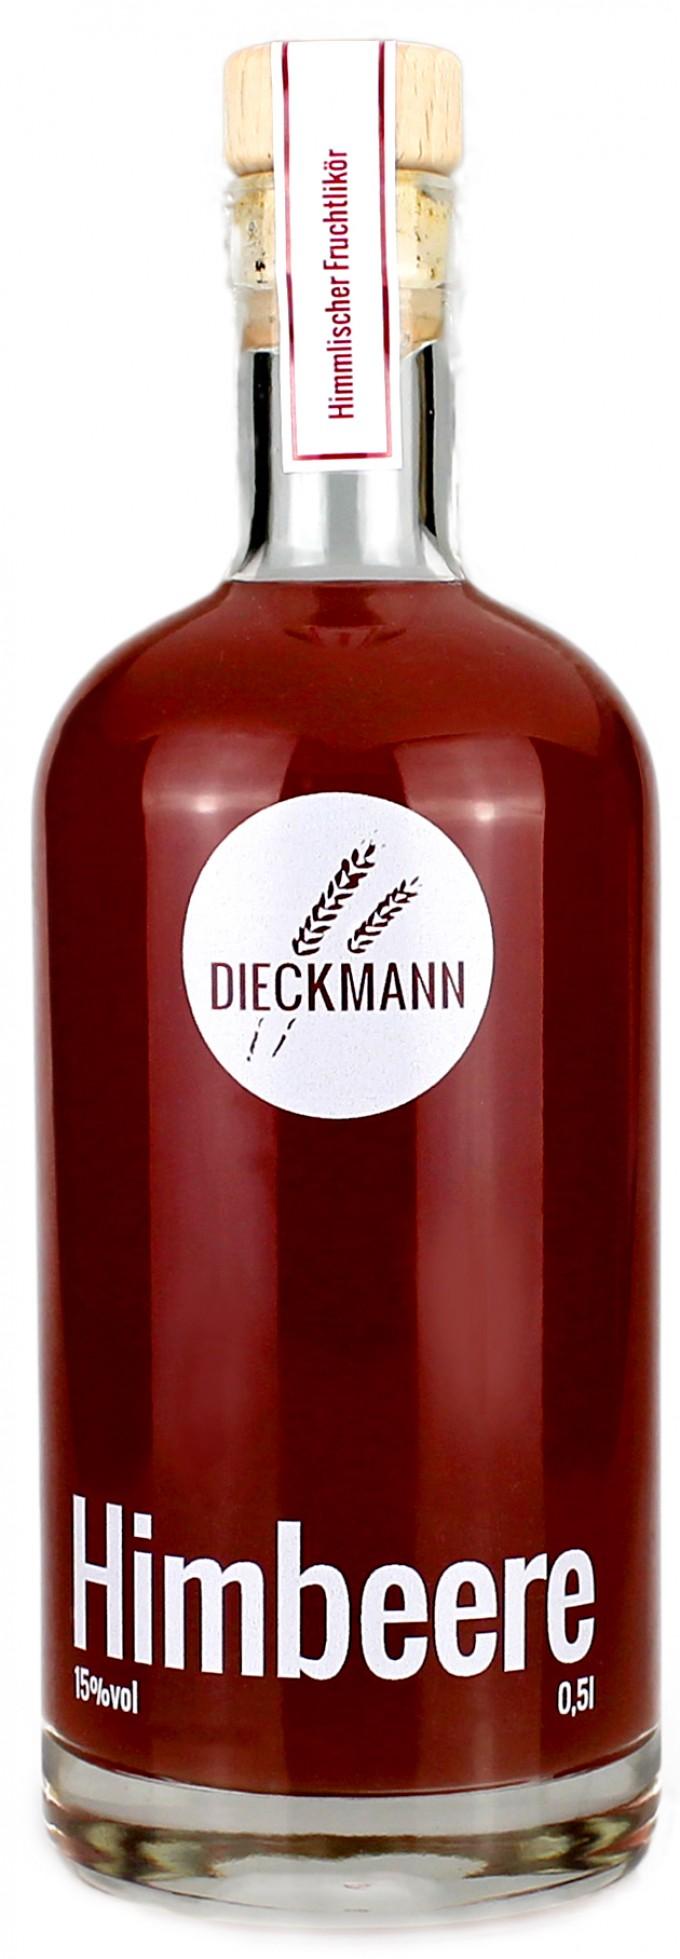 Weizenbrennerei & Likörmanufaktur Dieckmann Himbeere - Fruchtlikör LIKÖR 15%vol., 0,5l